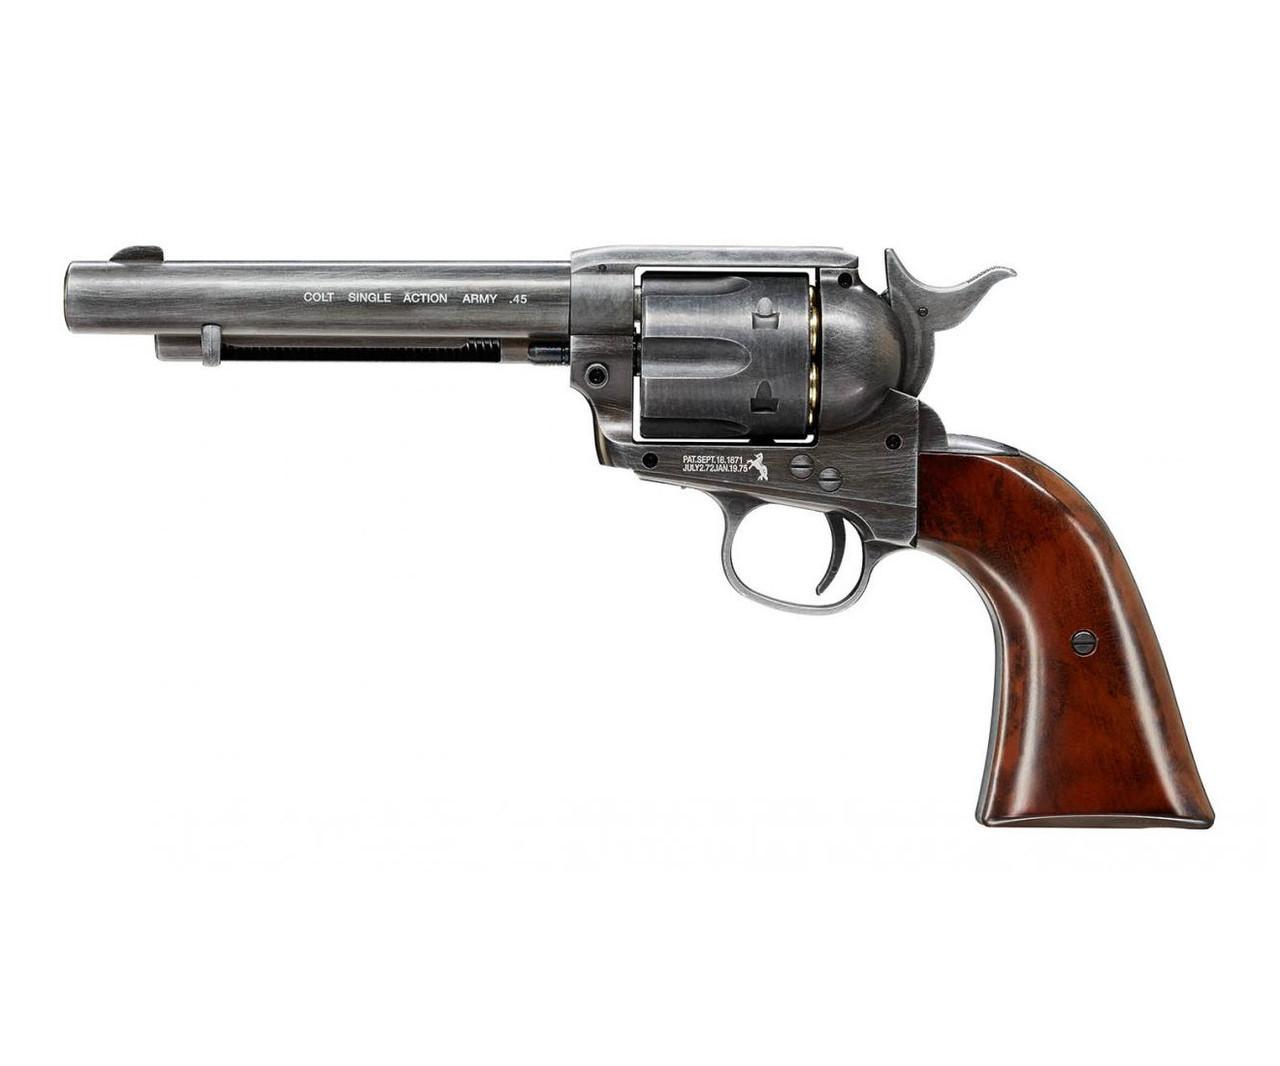 Пневматичний пістолет Umarex COLT SINGLE ACTION ARMY 45, 5,8307